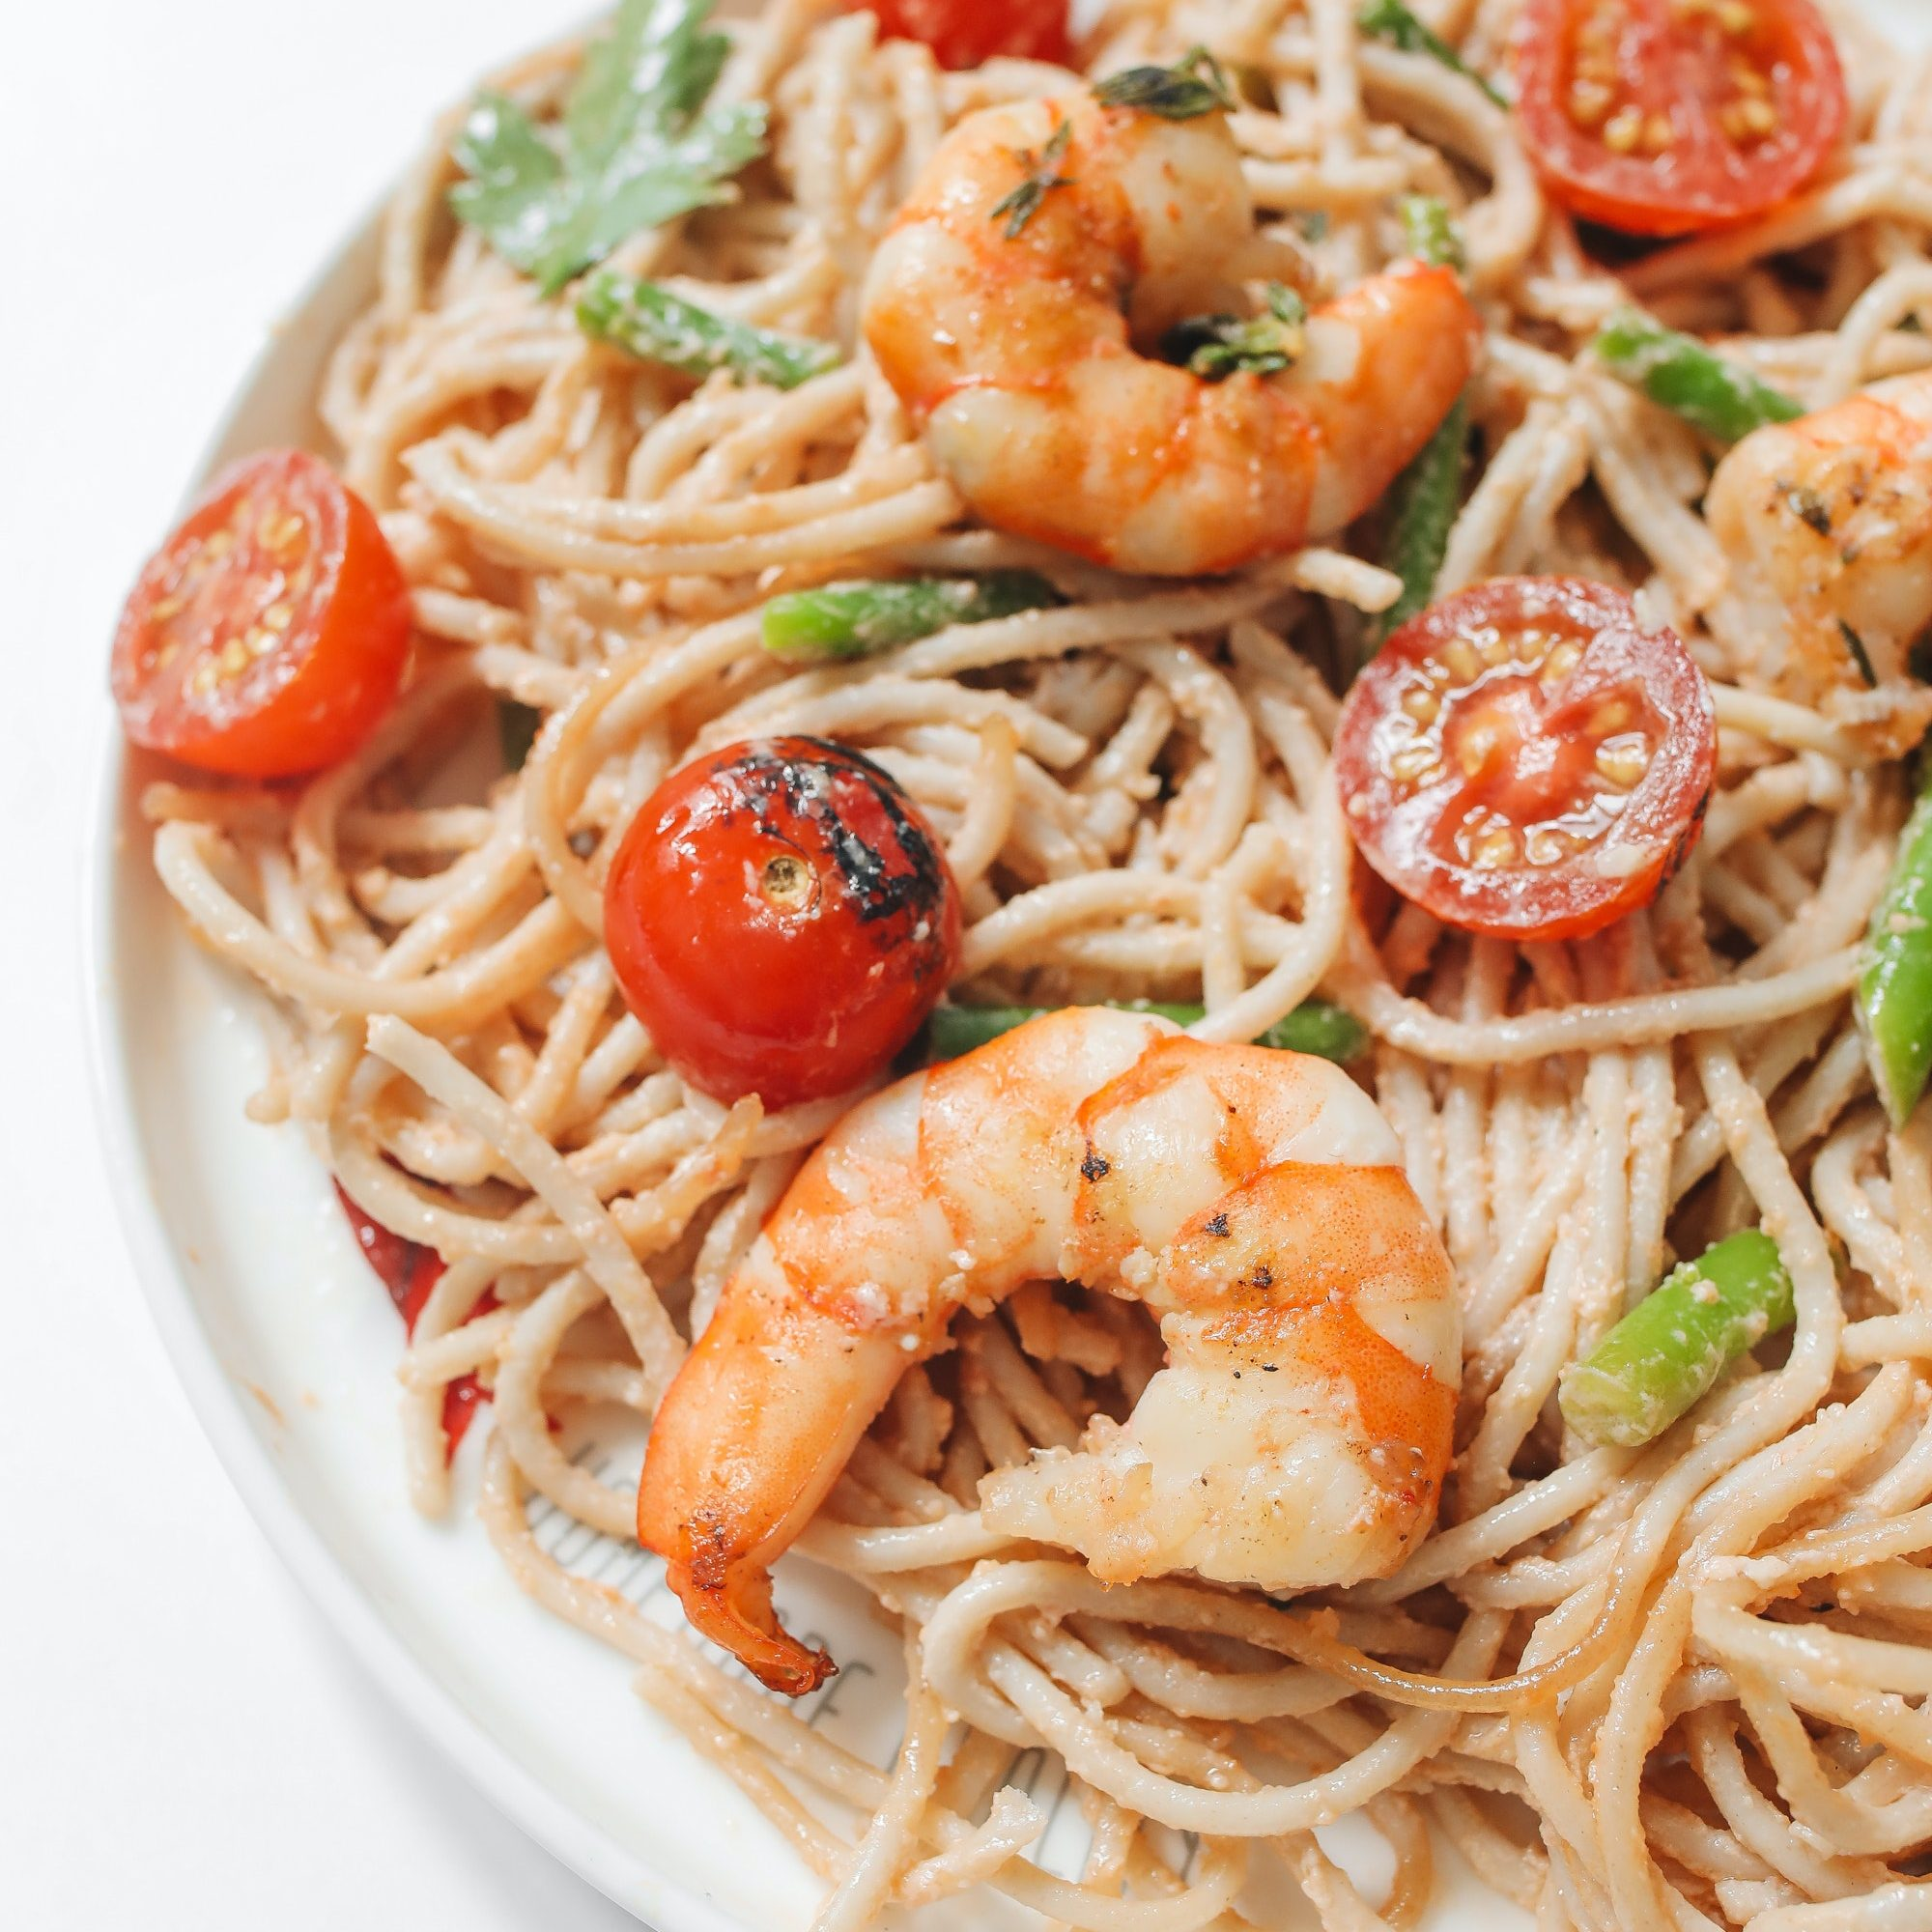 pates-al-dente-gastronomie-italie